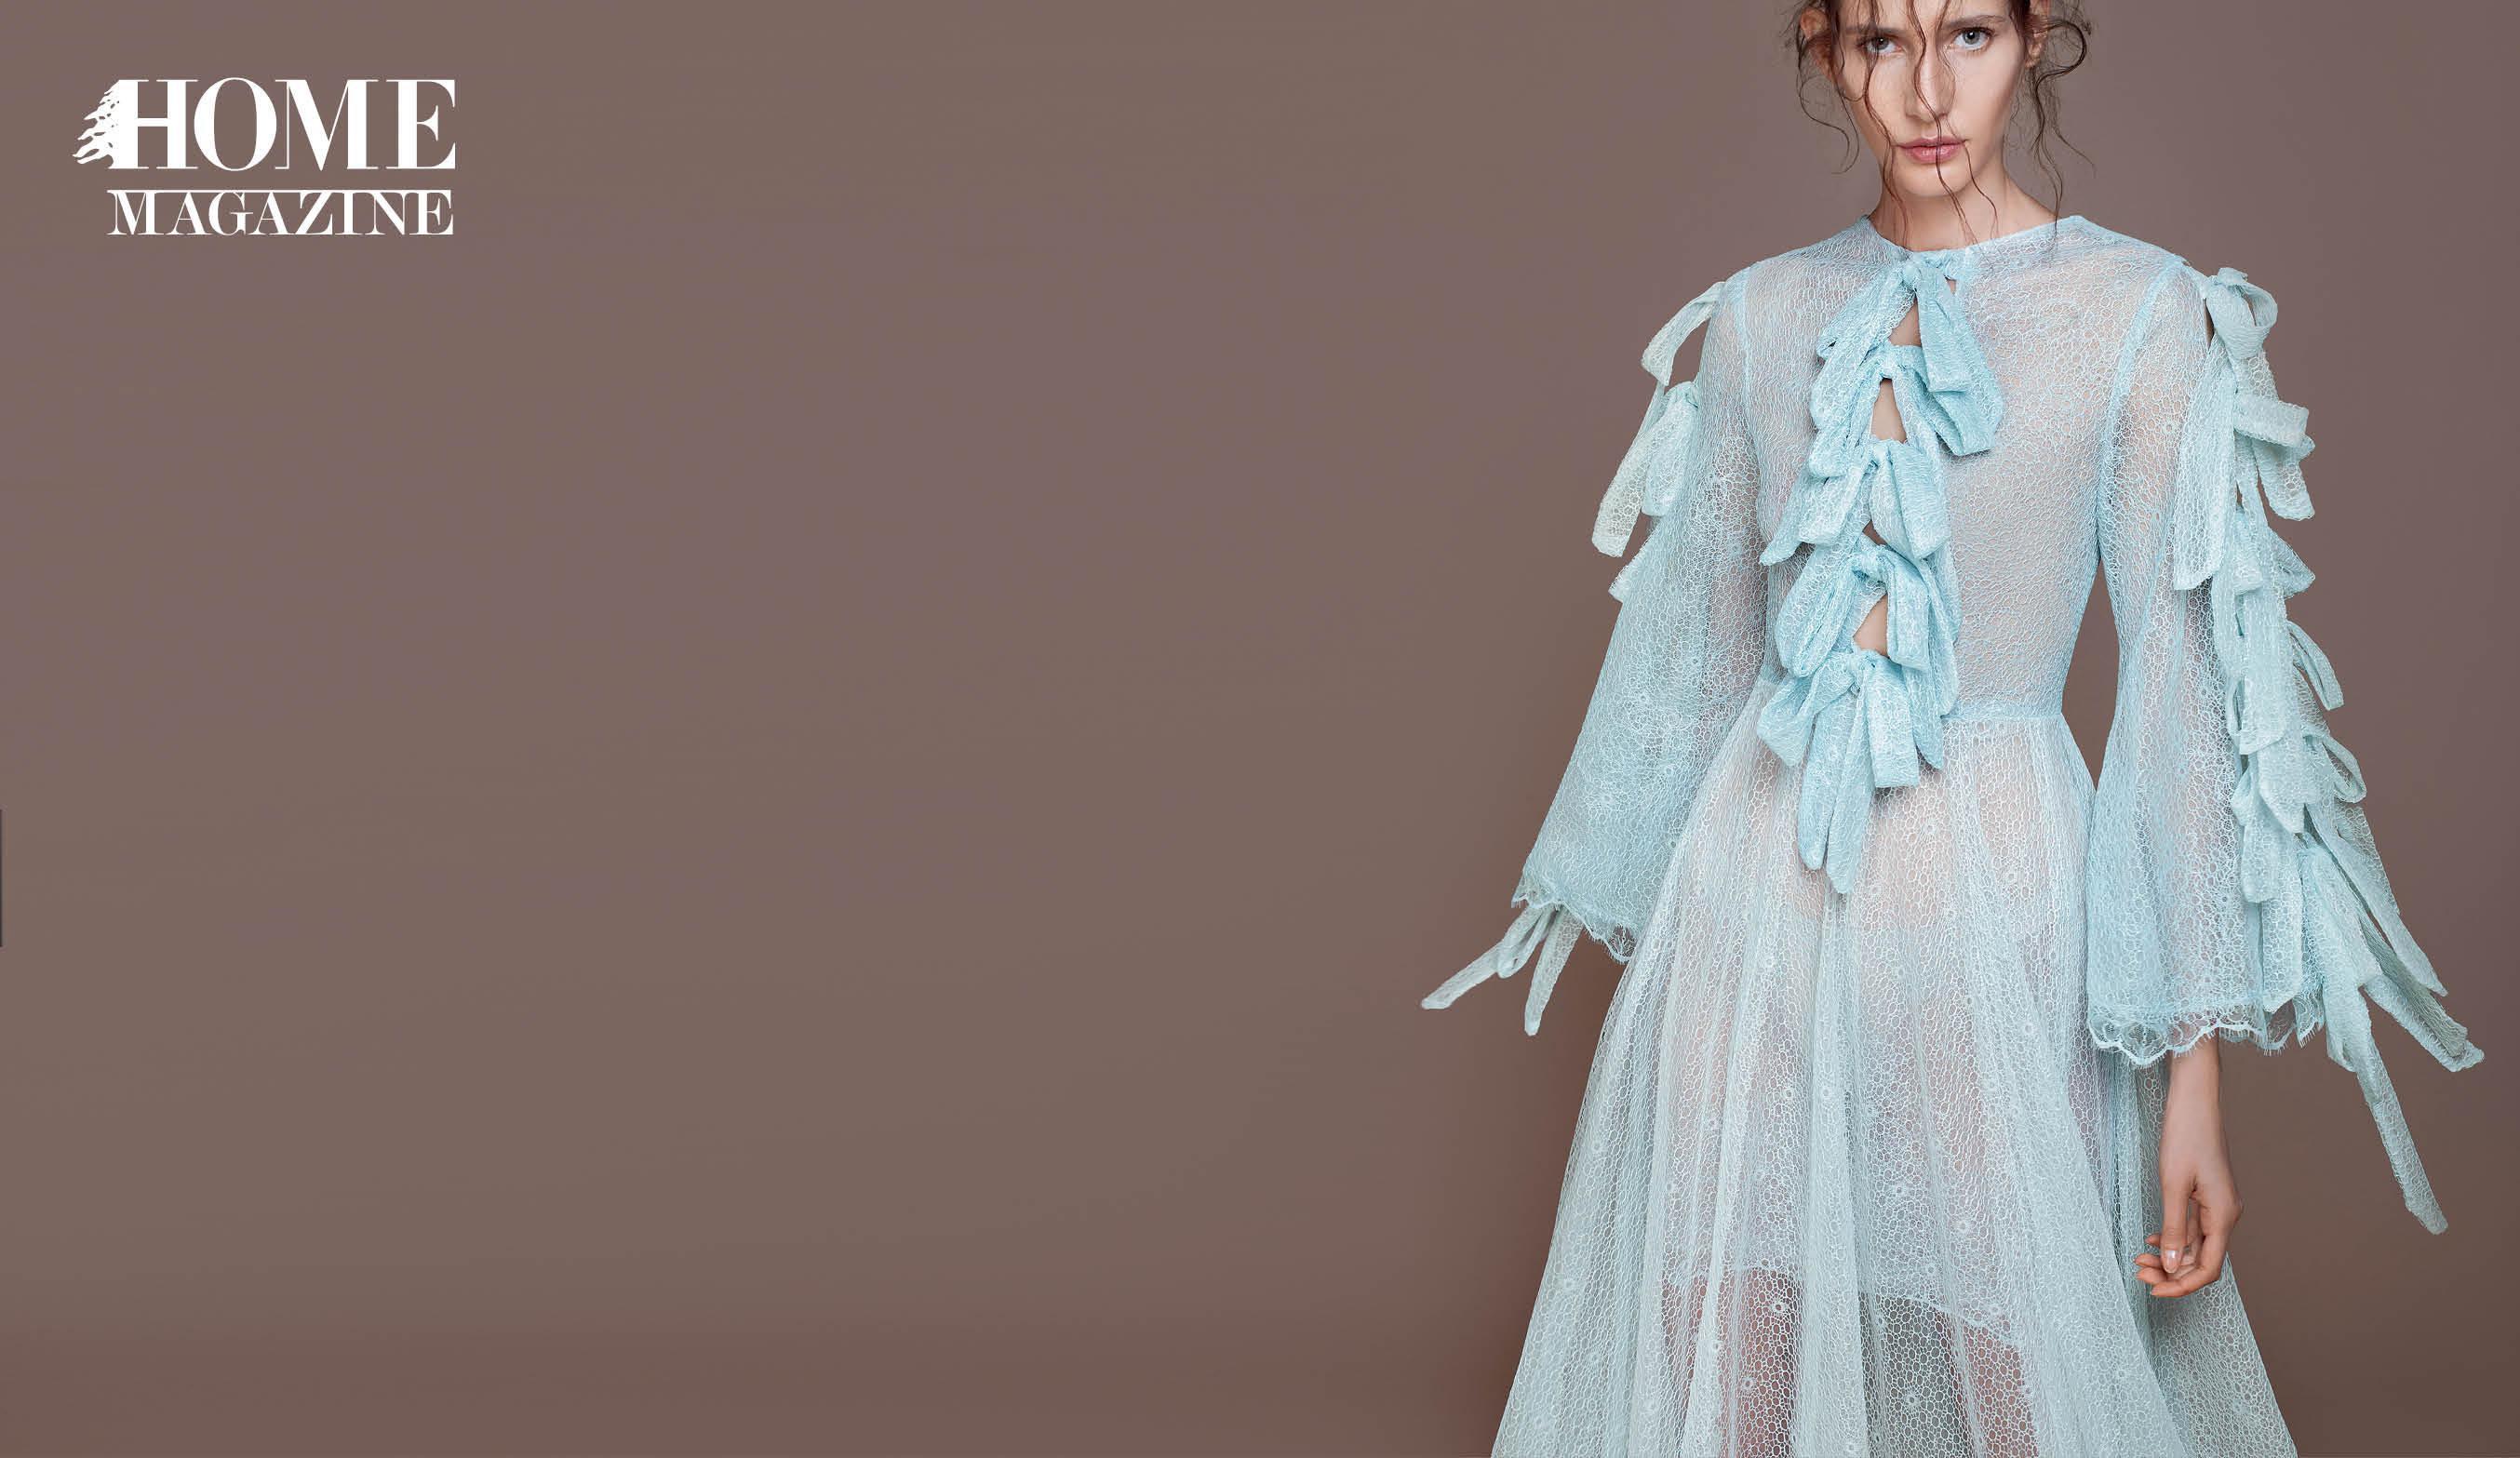 Model in light blue dress